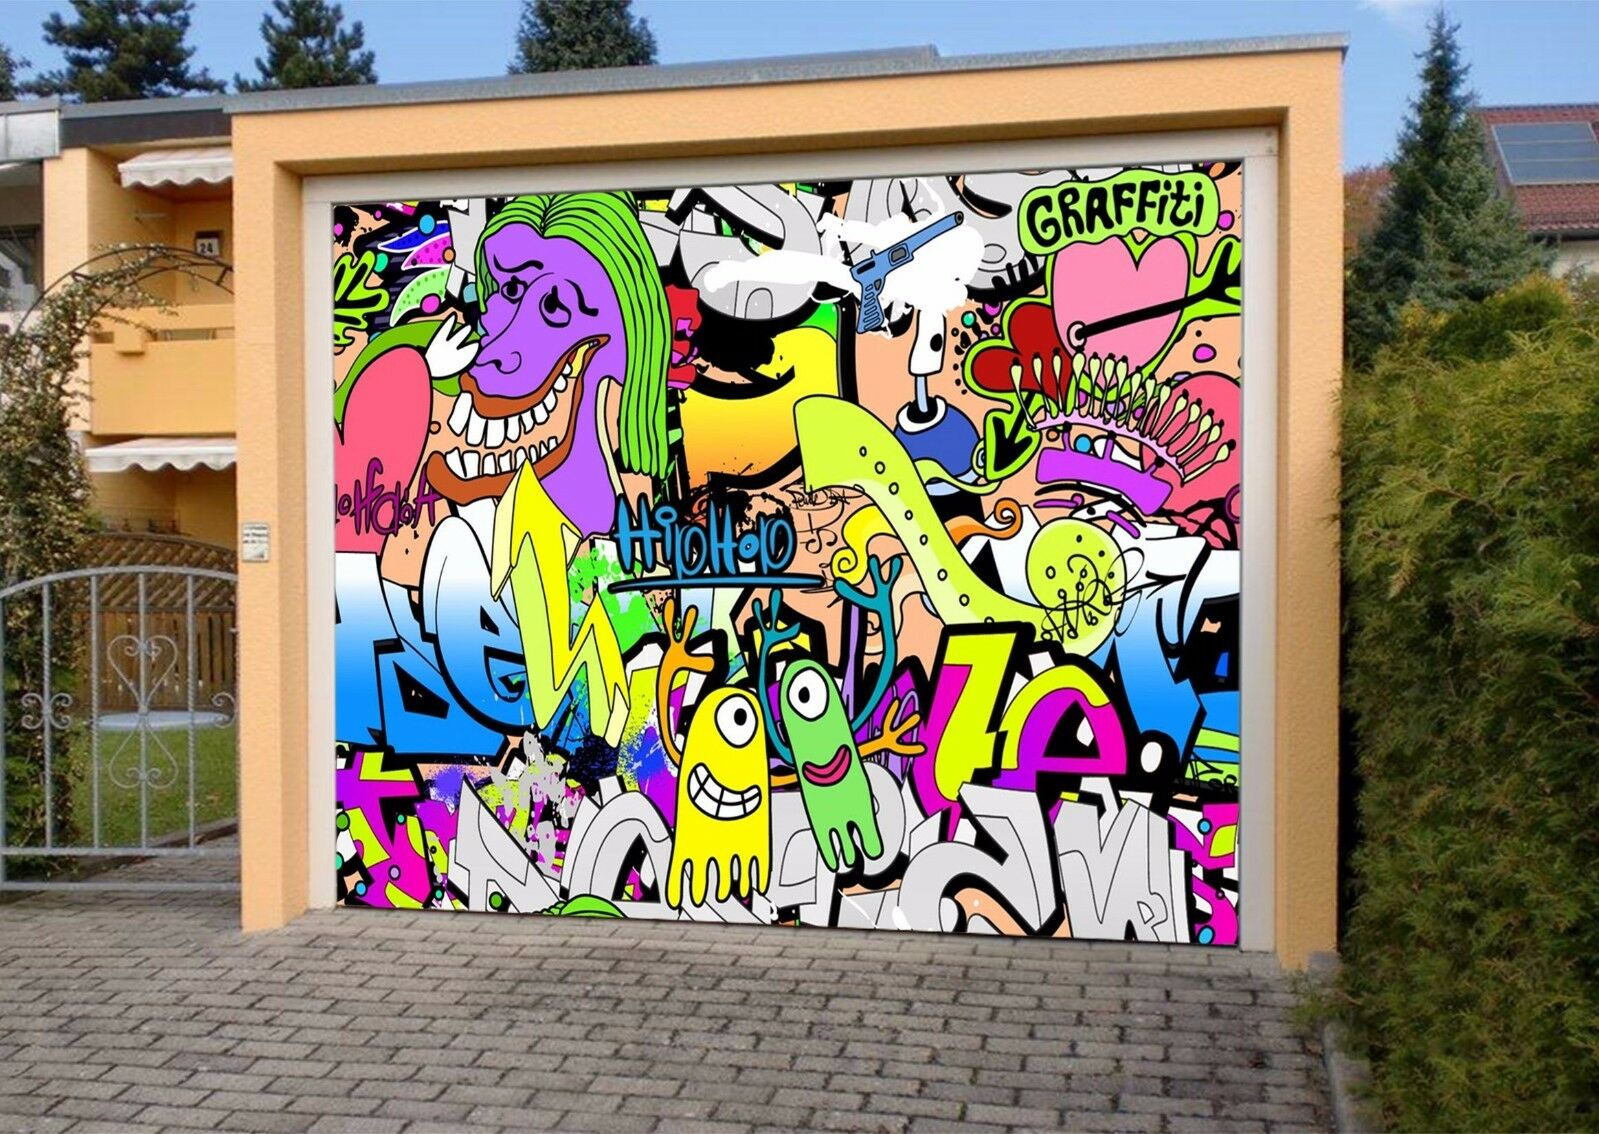 693 Graffiti 3d Garage Wall Lemon Au Wallpaper Aj Wall Decal